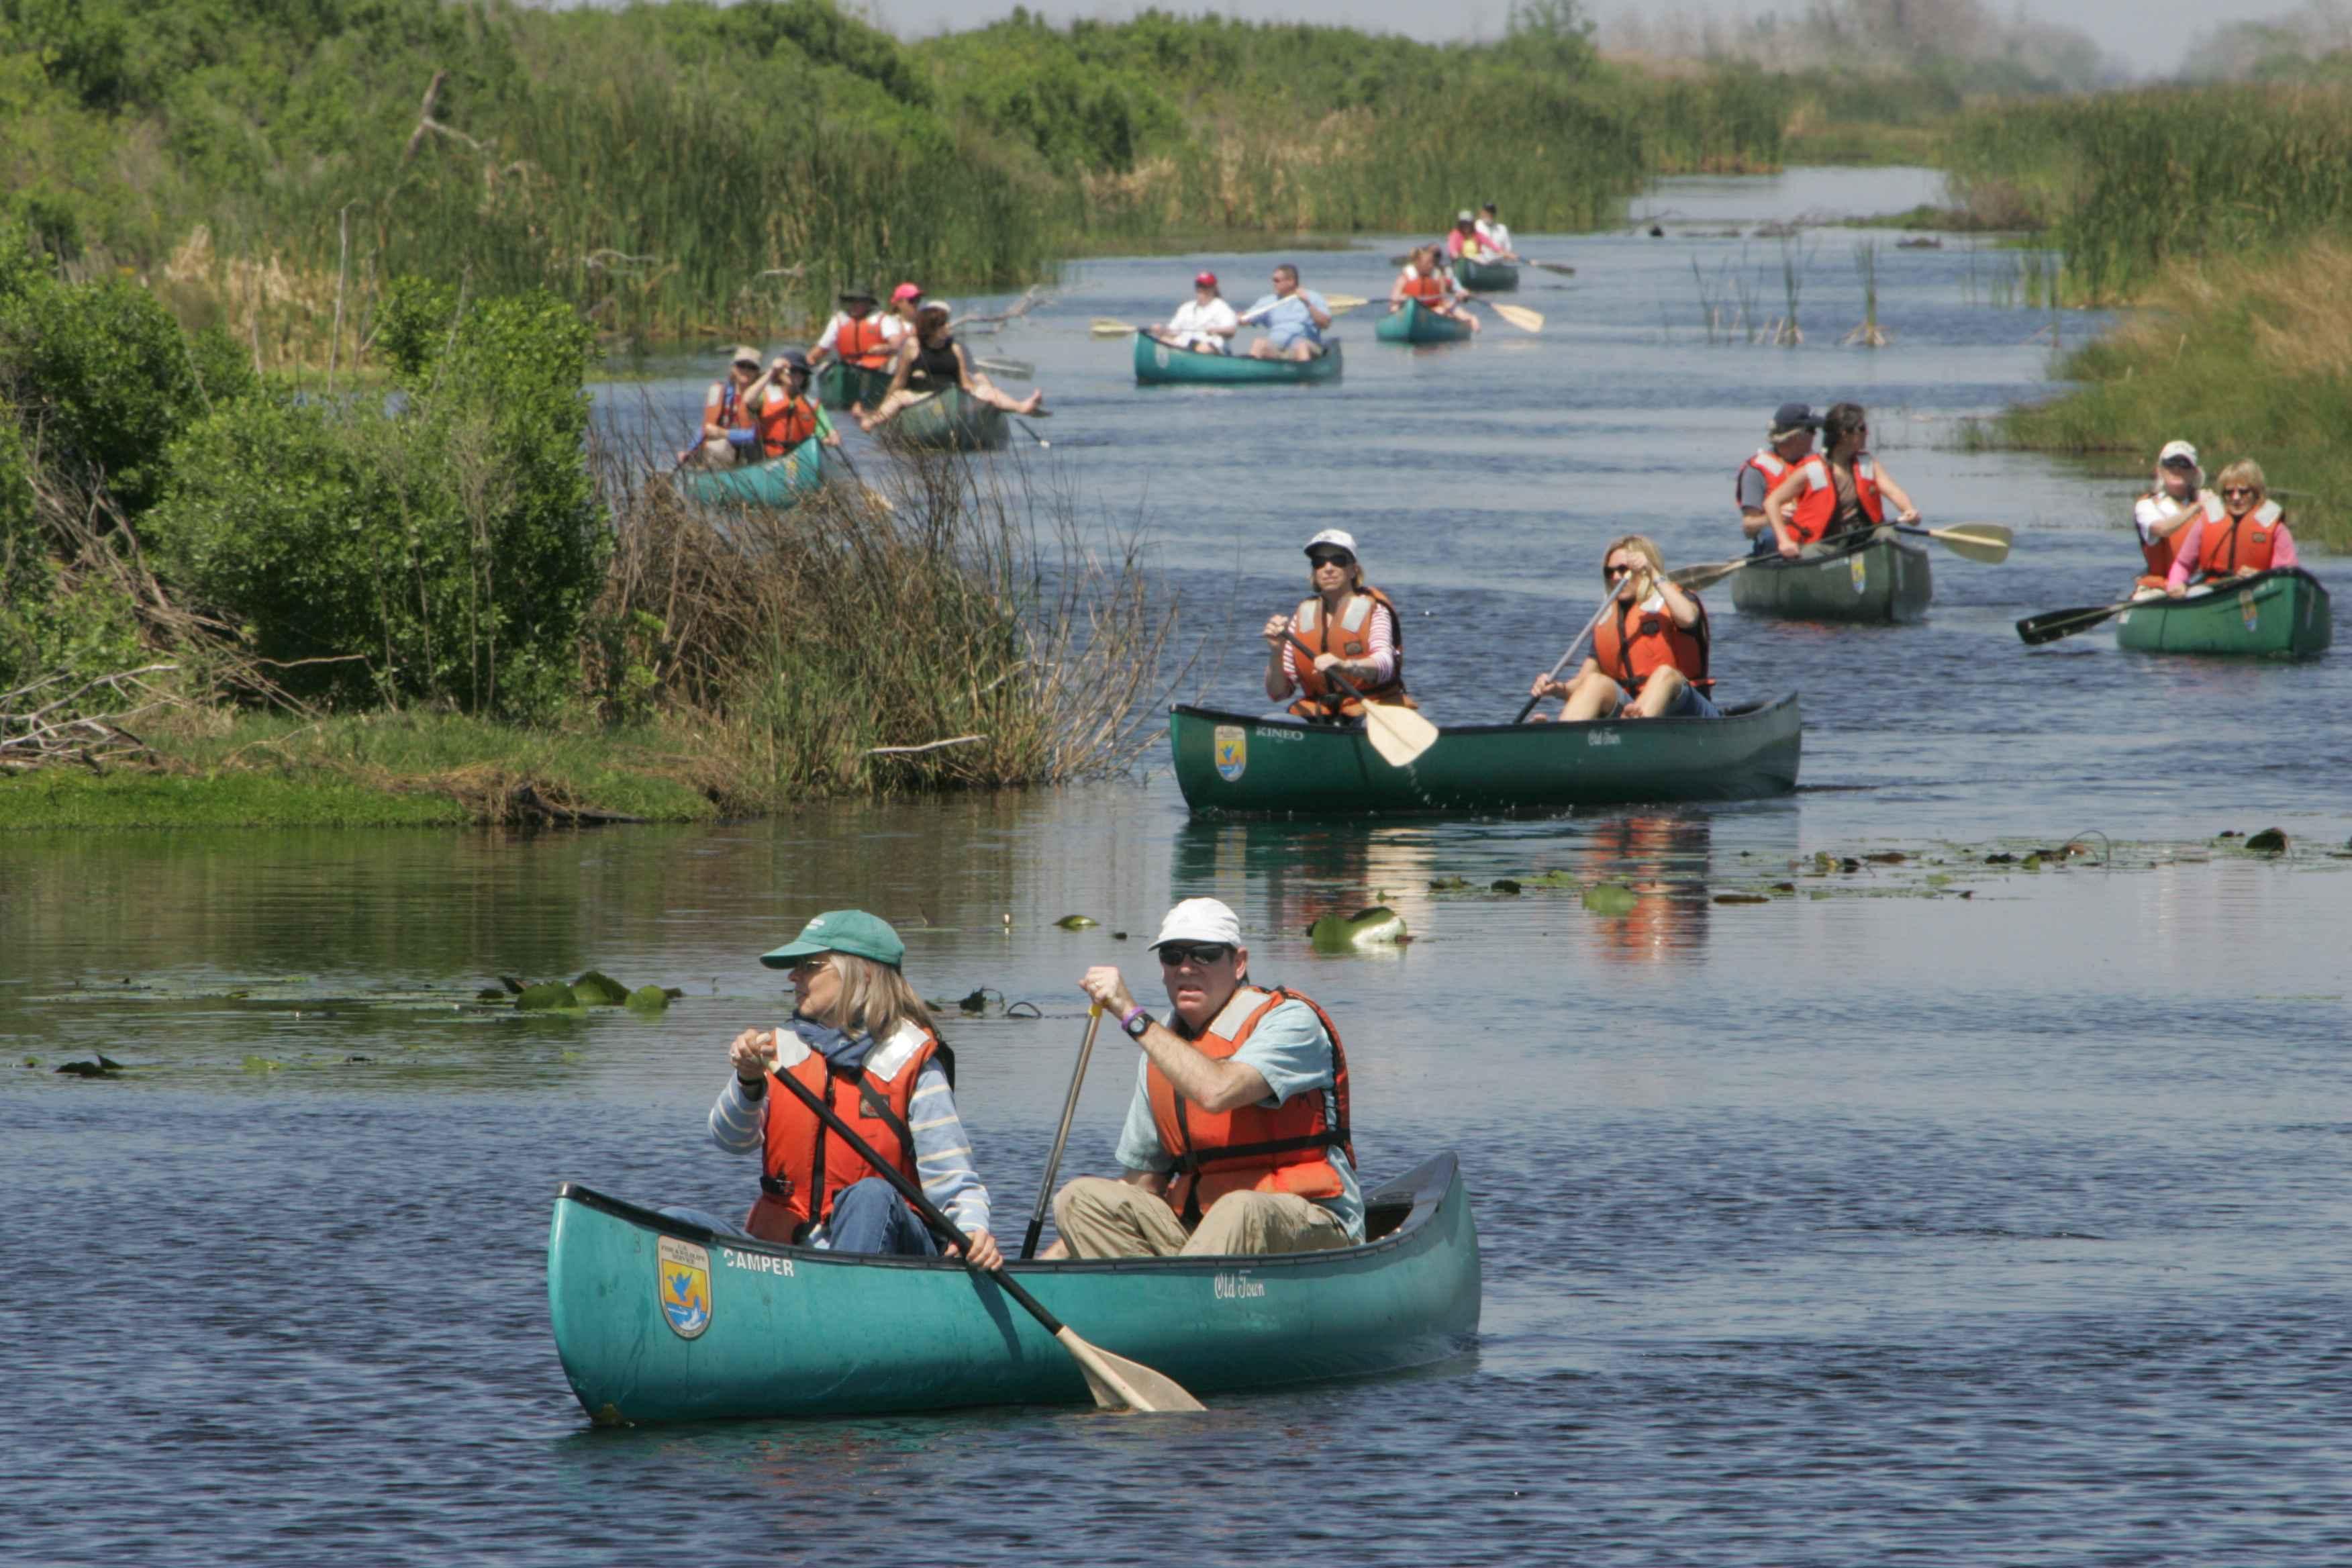 Touring The Everglades National Park